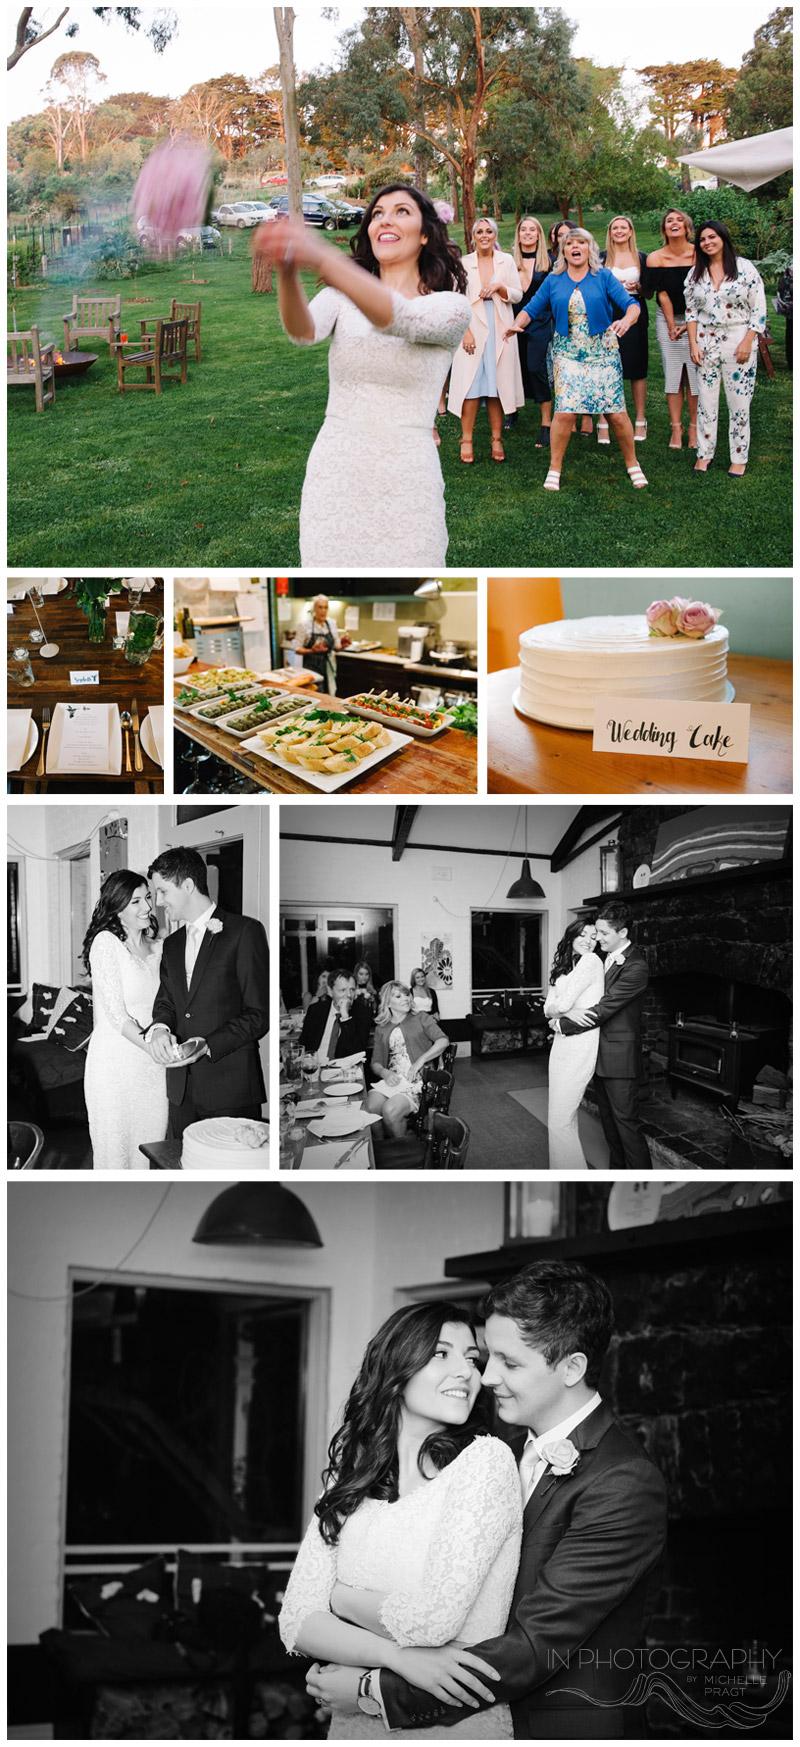 wedding reception on Mornington peninsula health retreat